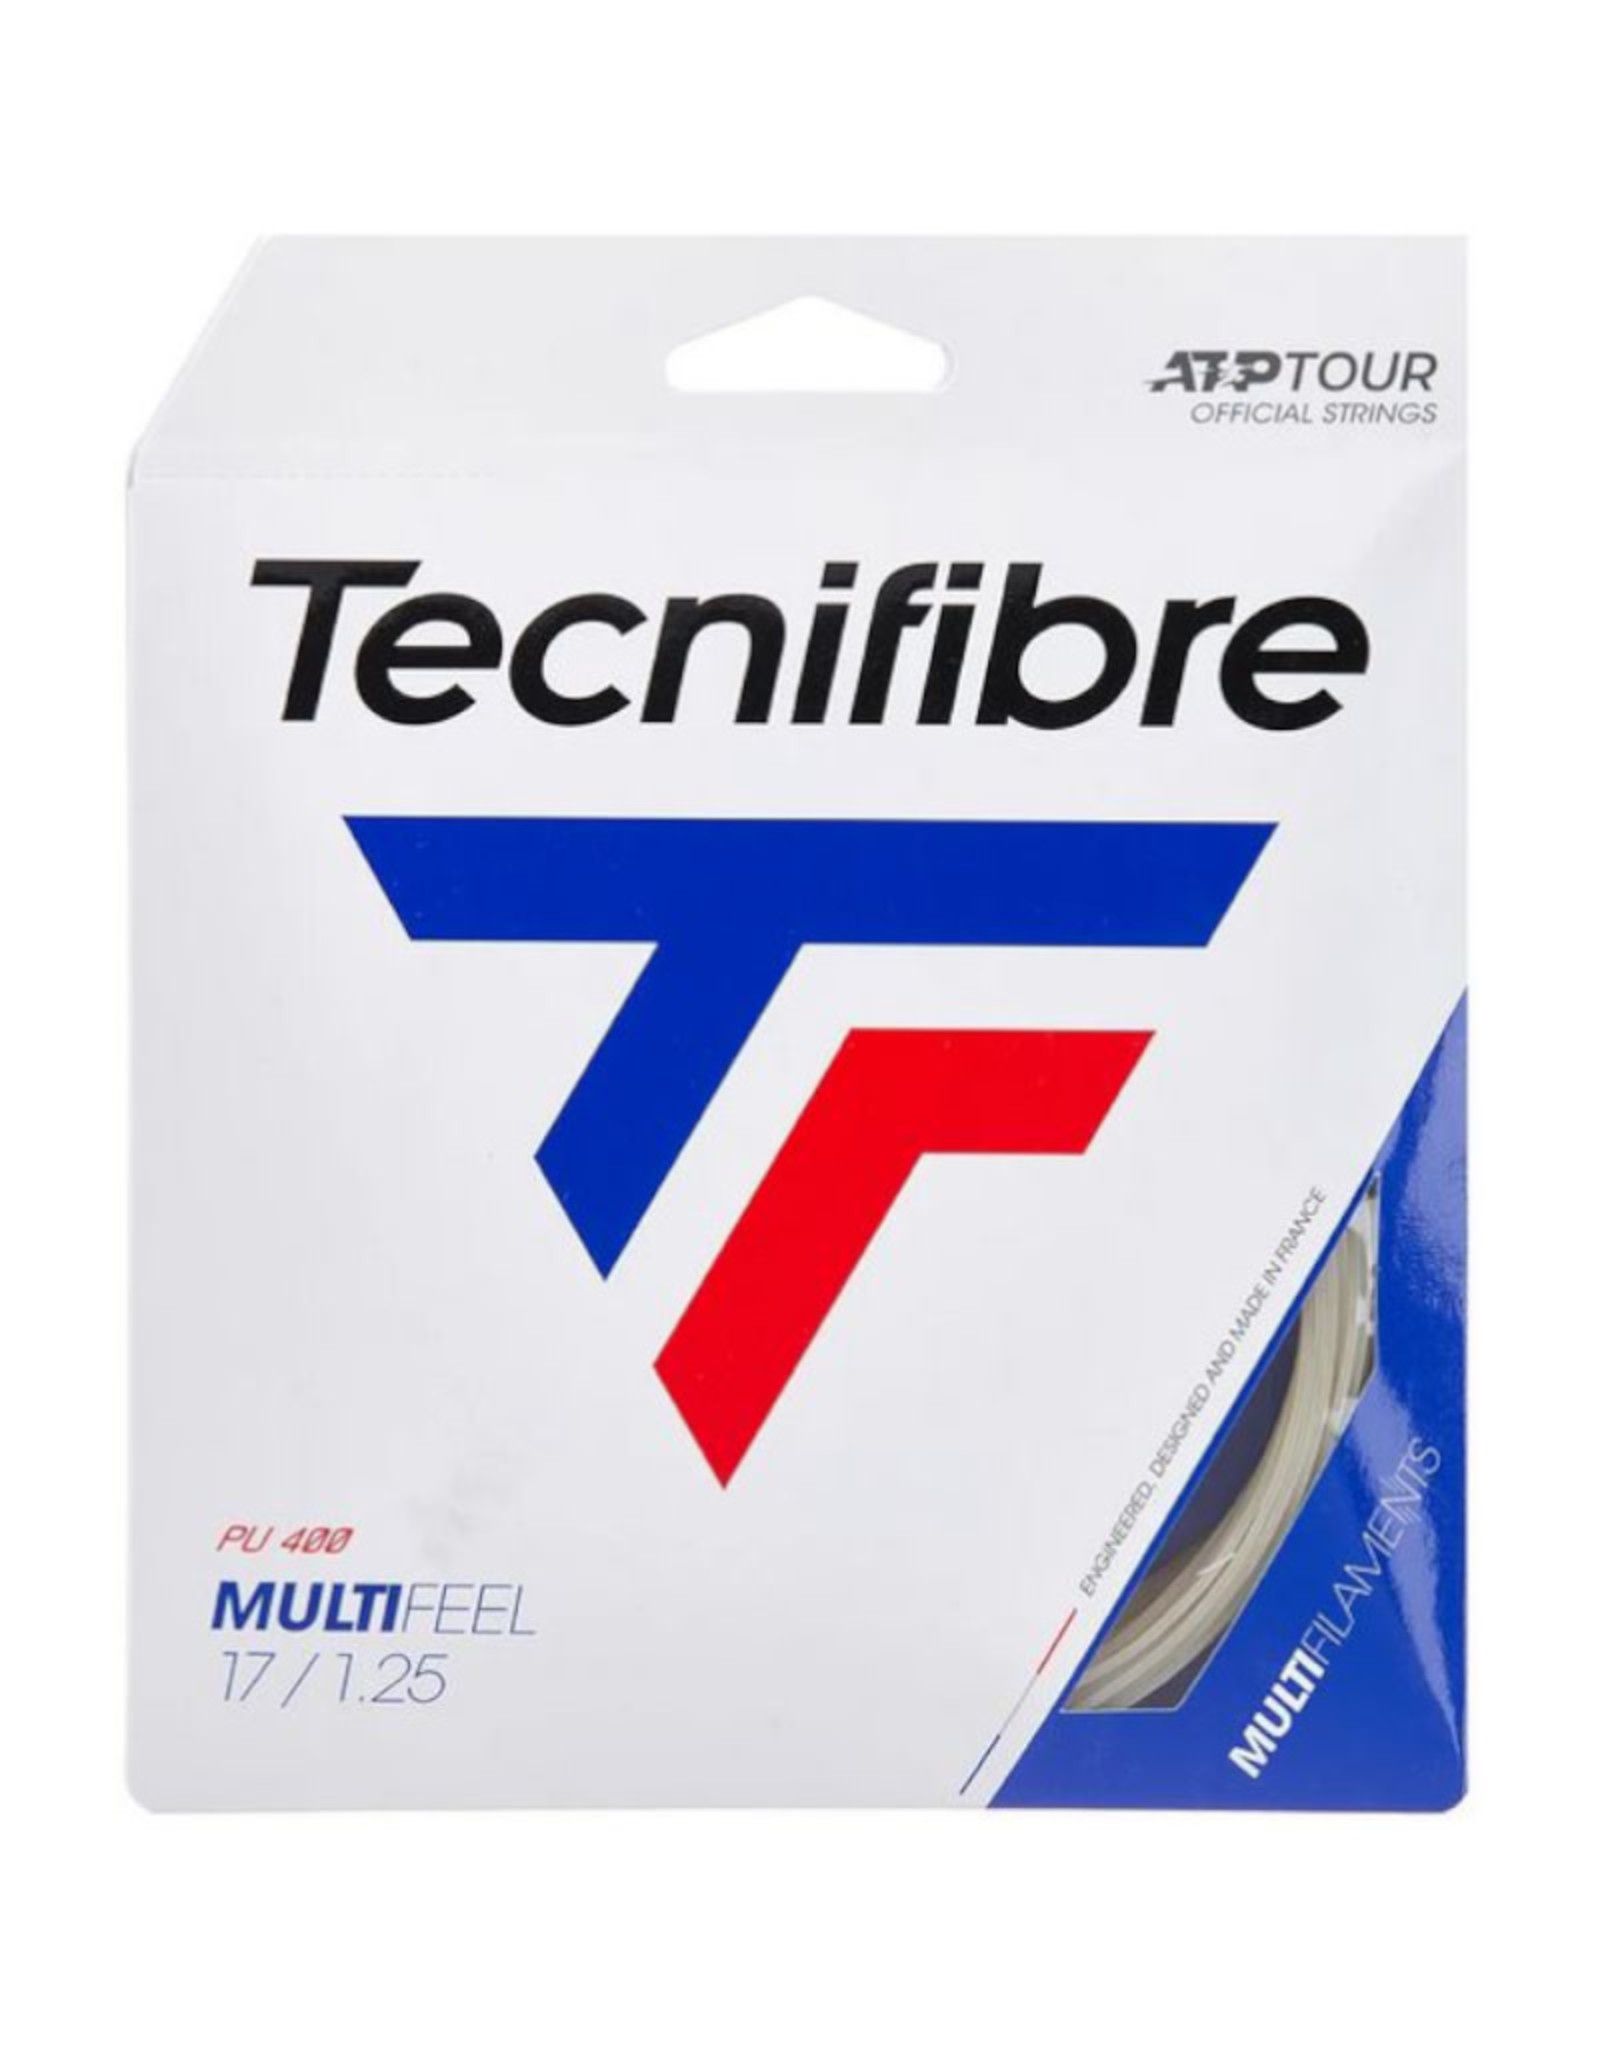 TECNIFIBRE MULTI FEEL 17 FULL SET (NATURAL)